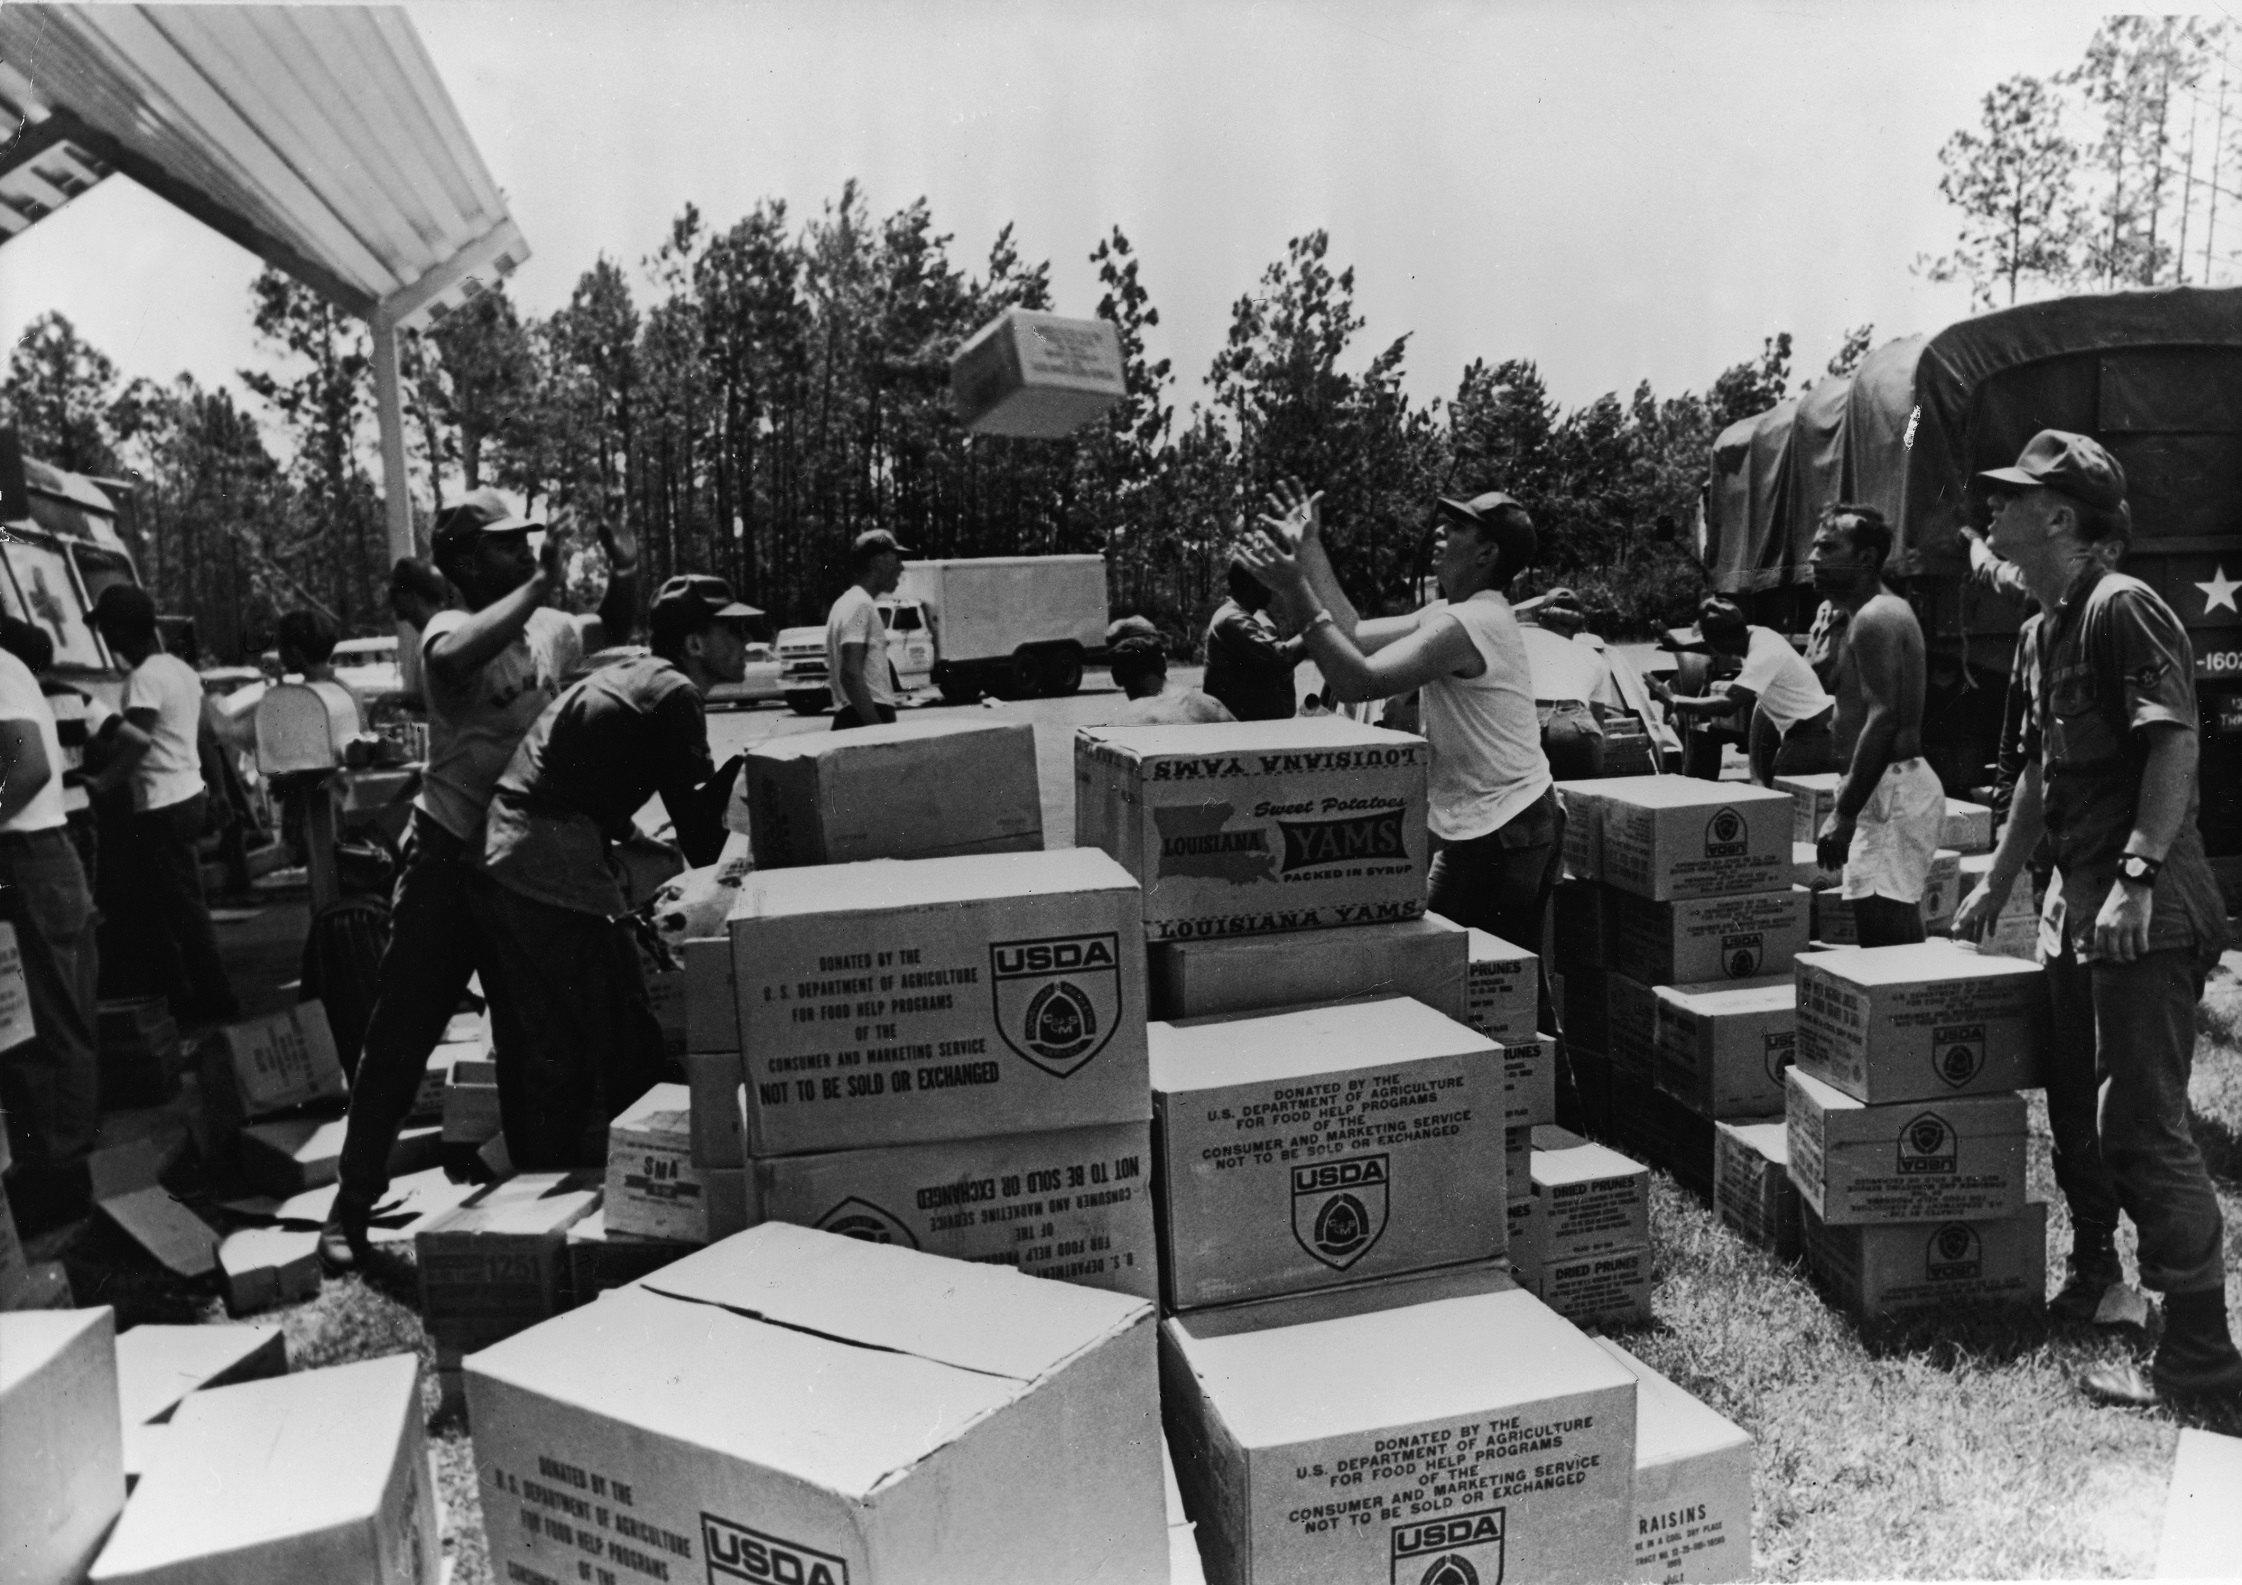 Hurricane Camille hits Biloxi, Miss., in 1969